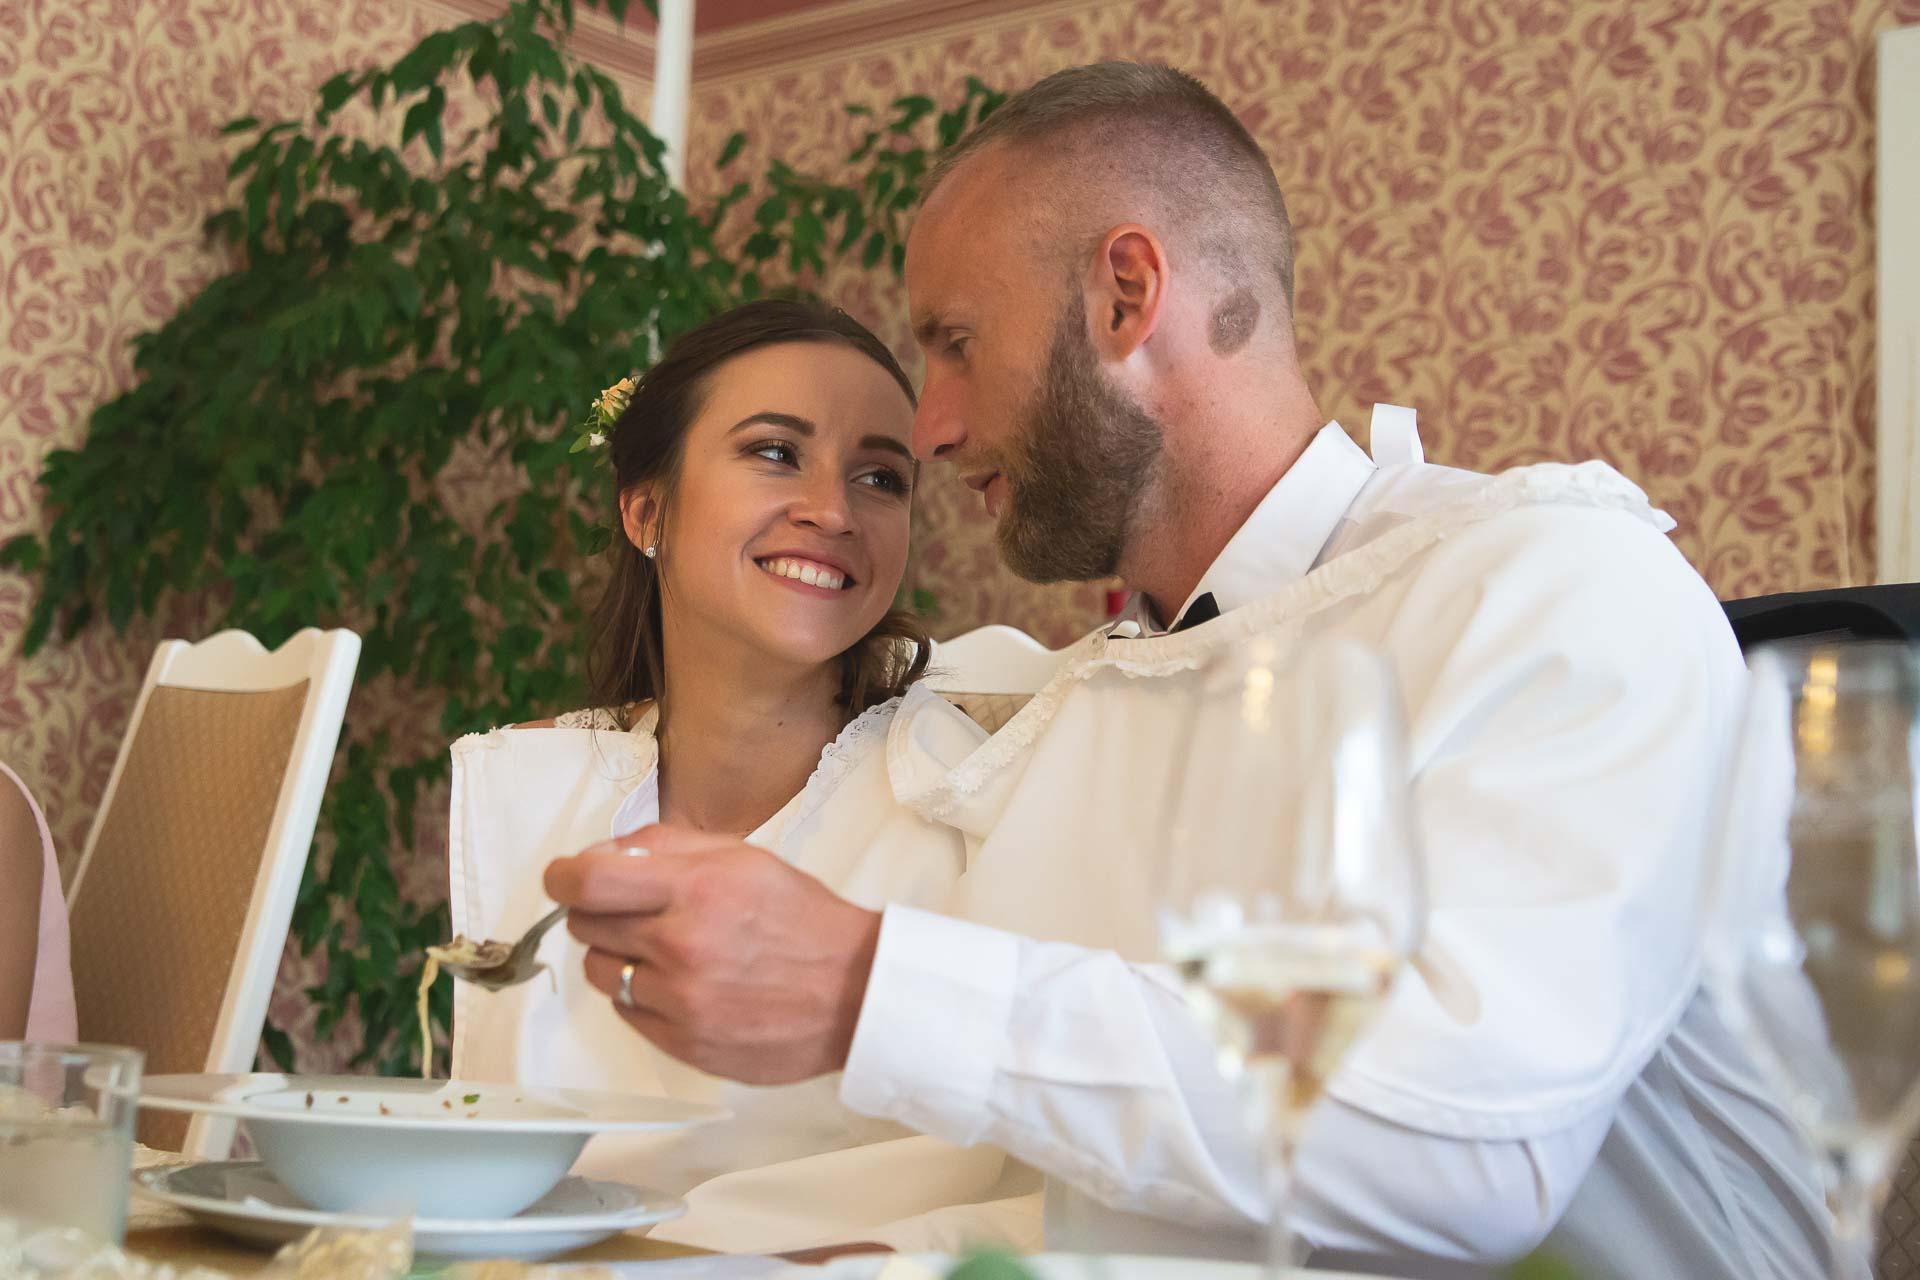 svatební-fotograf-svatebni-video-Nymburk-hotel-Ostrov-Beautyfoto-6006